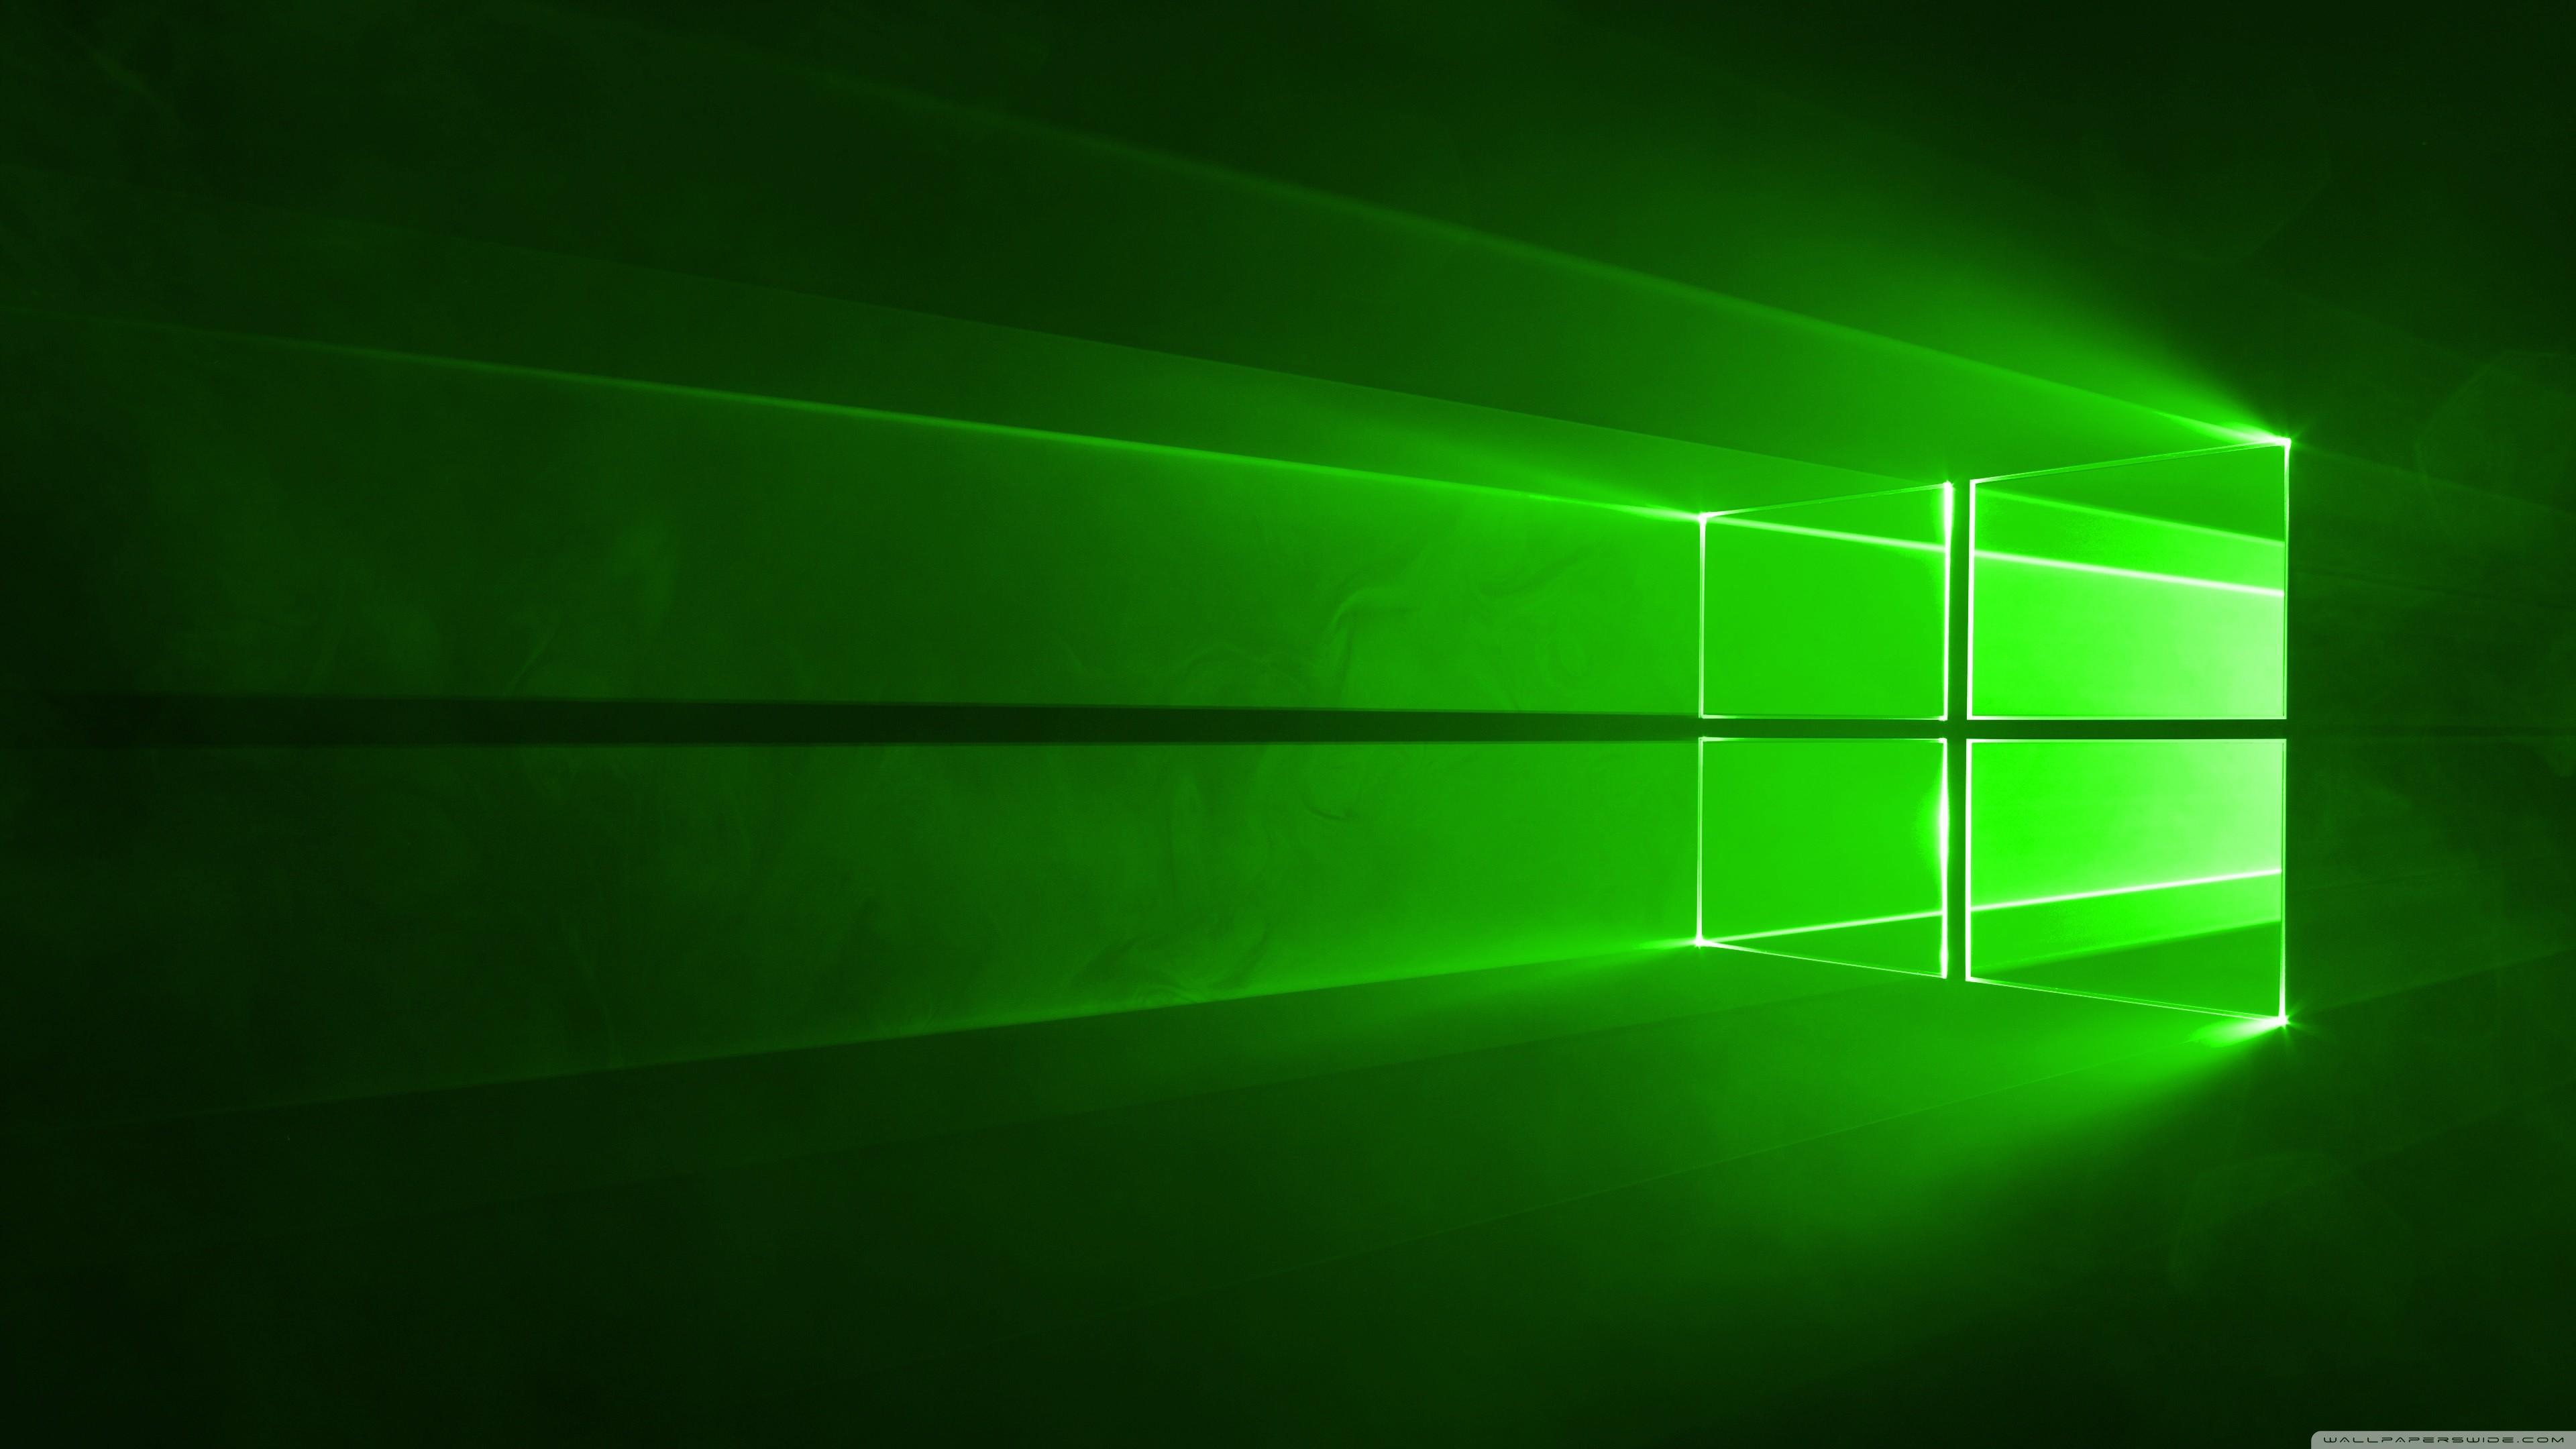 Windows 10 Green Wallpaper 71 images 3840x2160